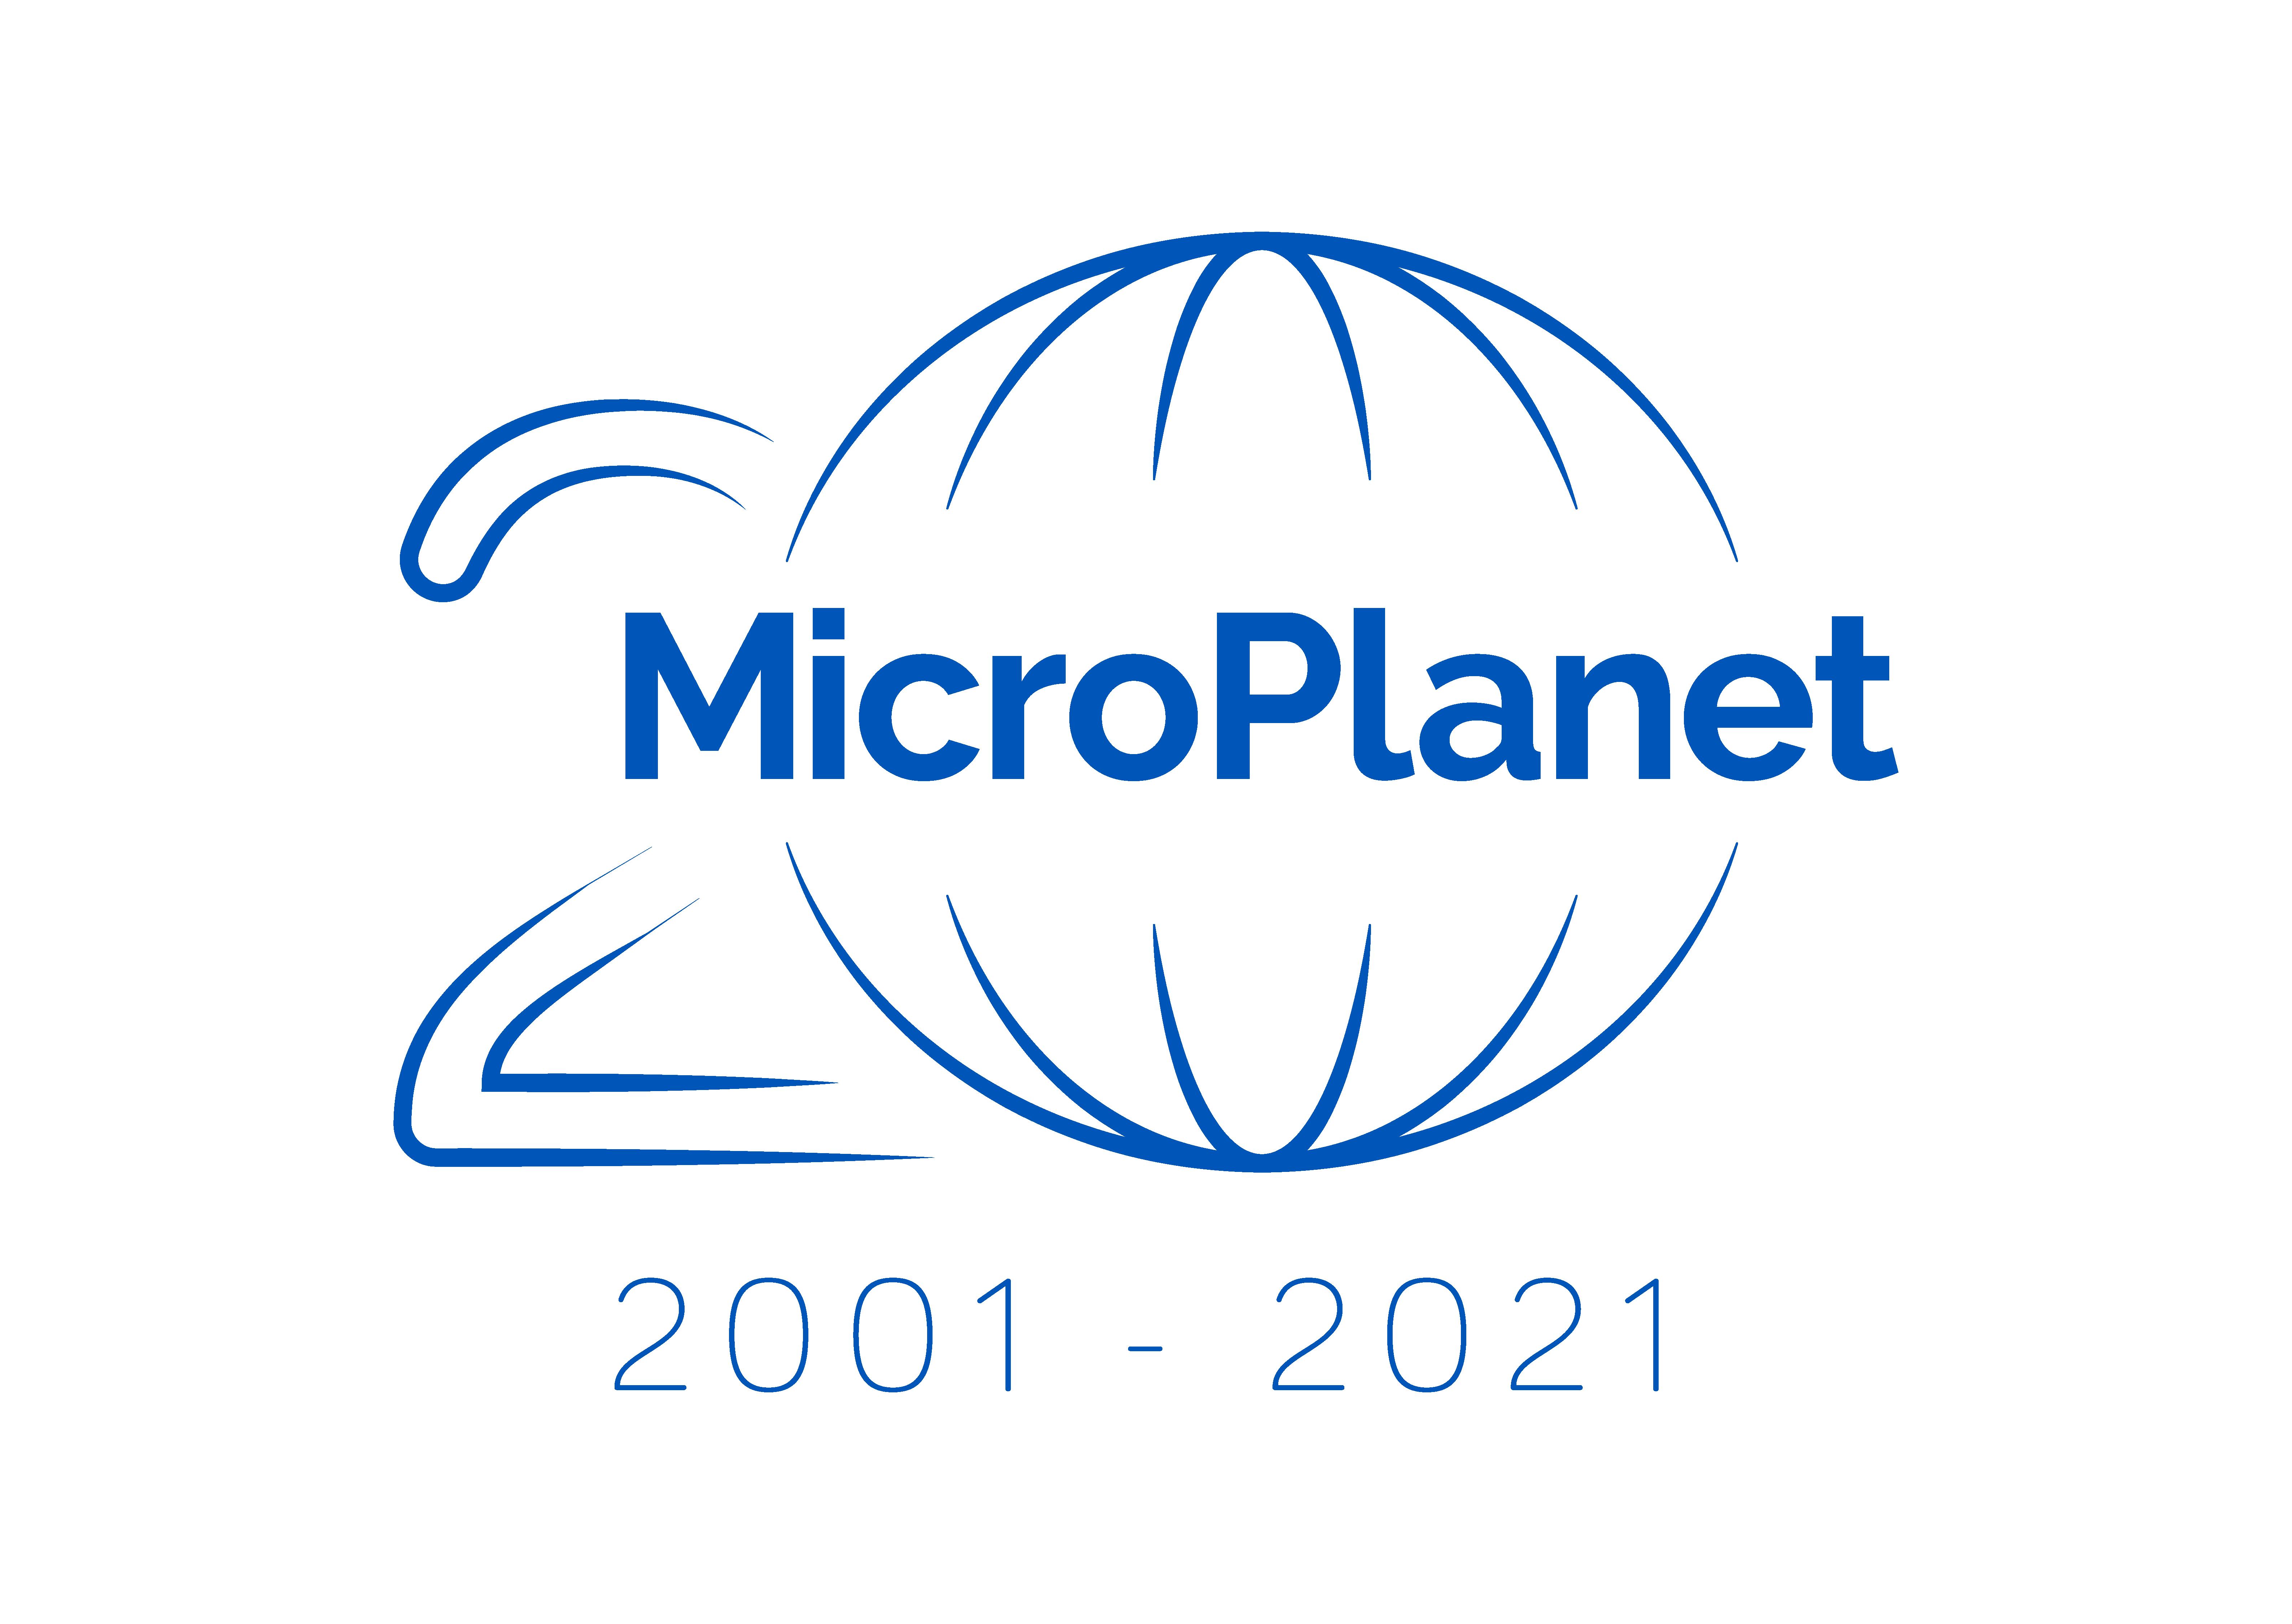 MicroPlanet renueva su imagen corporativa